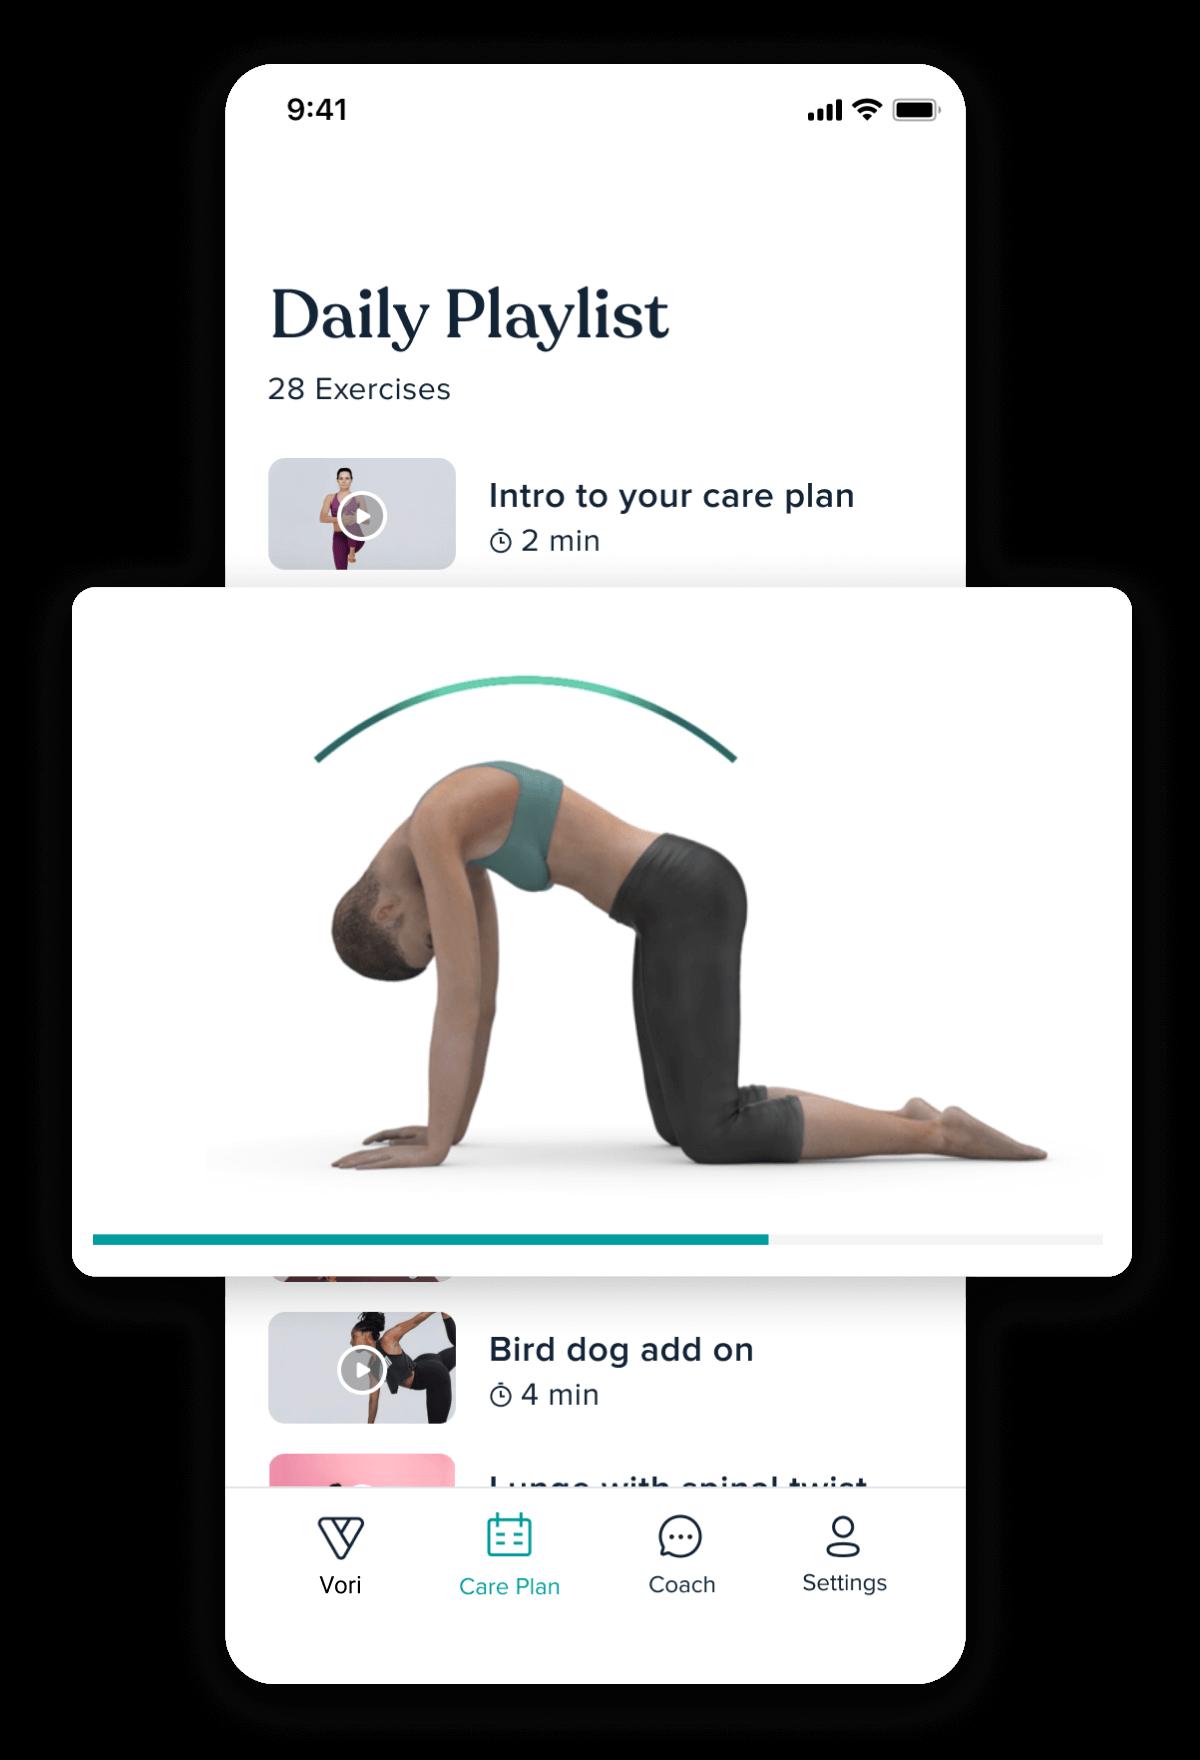 Playlist of exercises